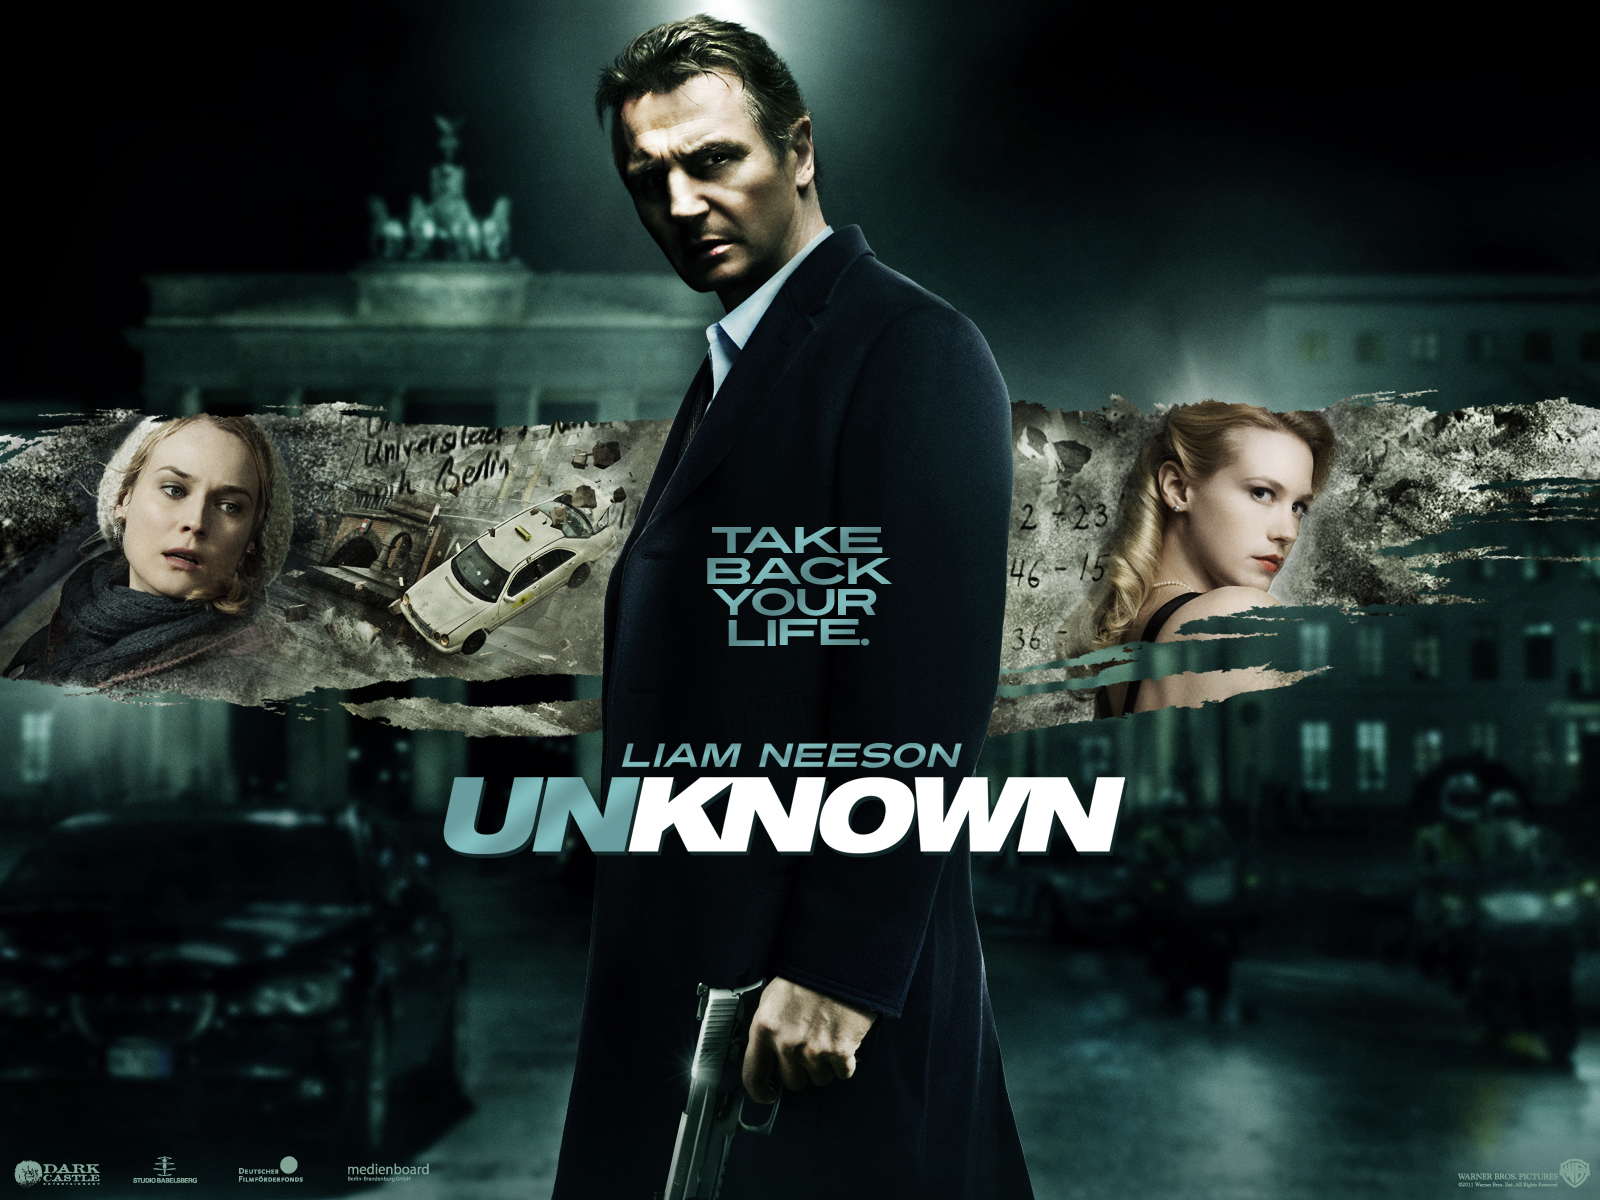 http://3.bp.blogspot.com/-x6fQViDkg7w/Tha8EaPcVmI/AAAAAAAAANQ/MjyECQSCSLg/s1600/Unknown-movies-poster.jpg